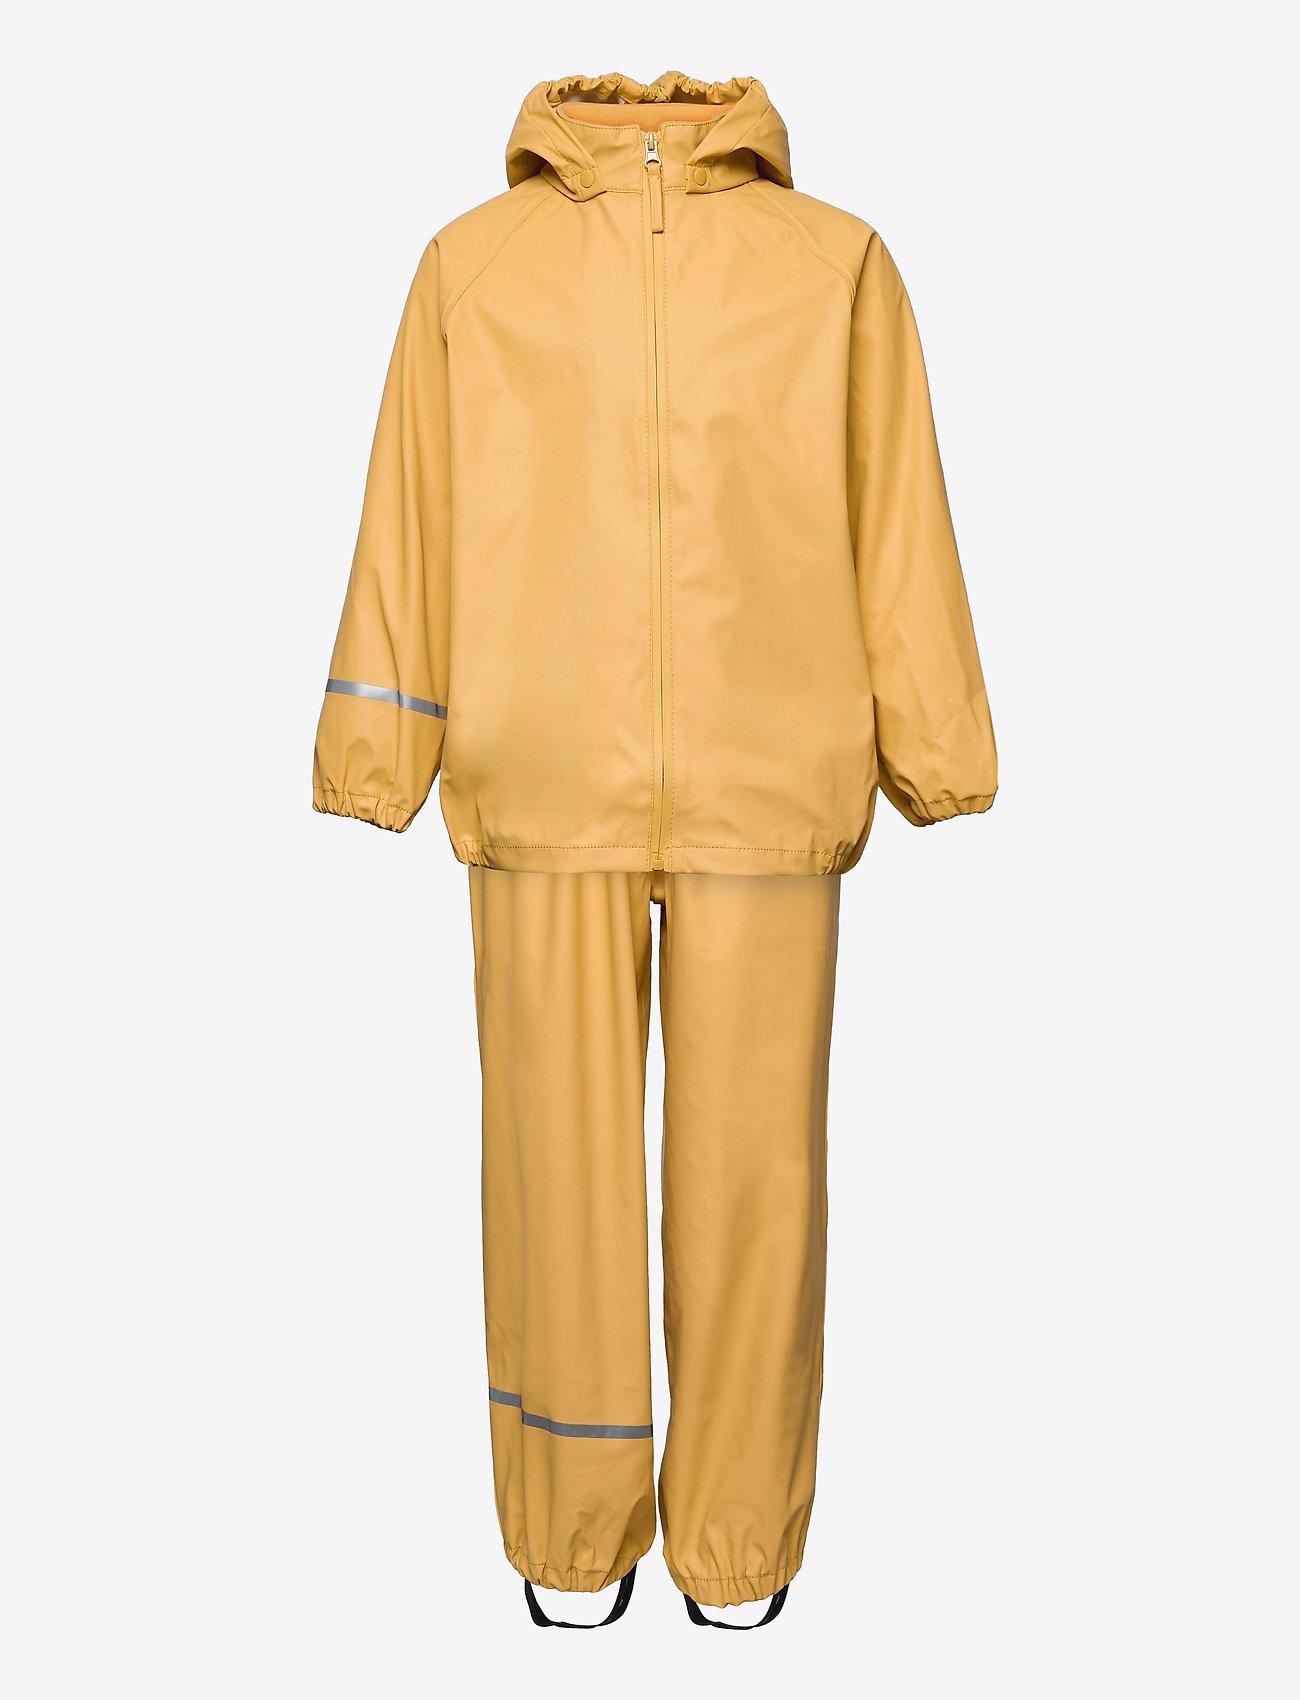 CeLaVi - Basic rainwear set -Recycle PU - sets & suits - rattan - 0